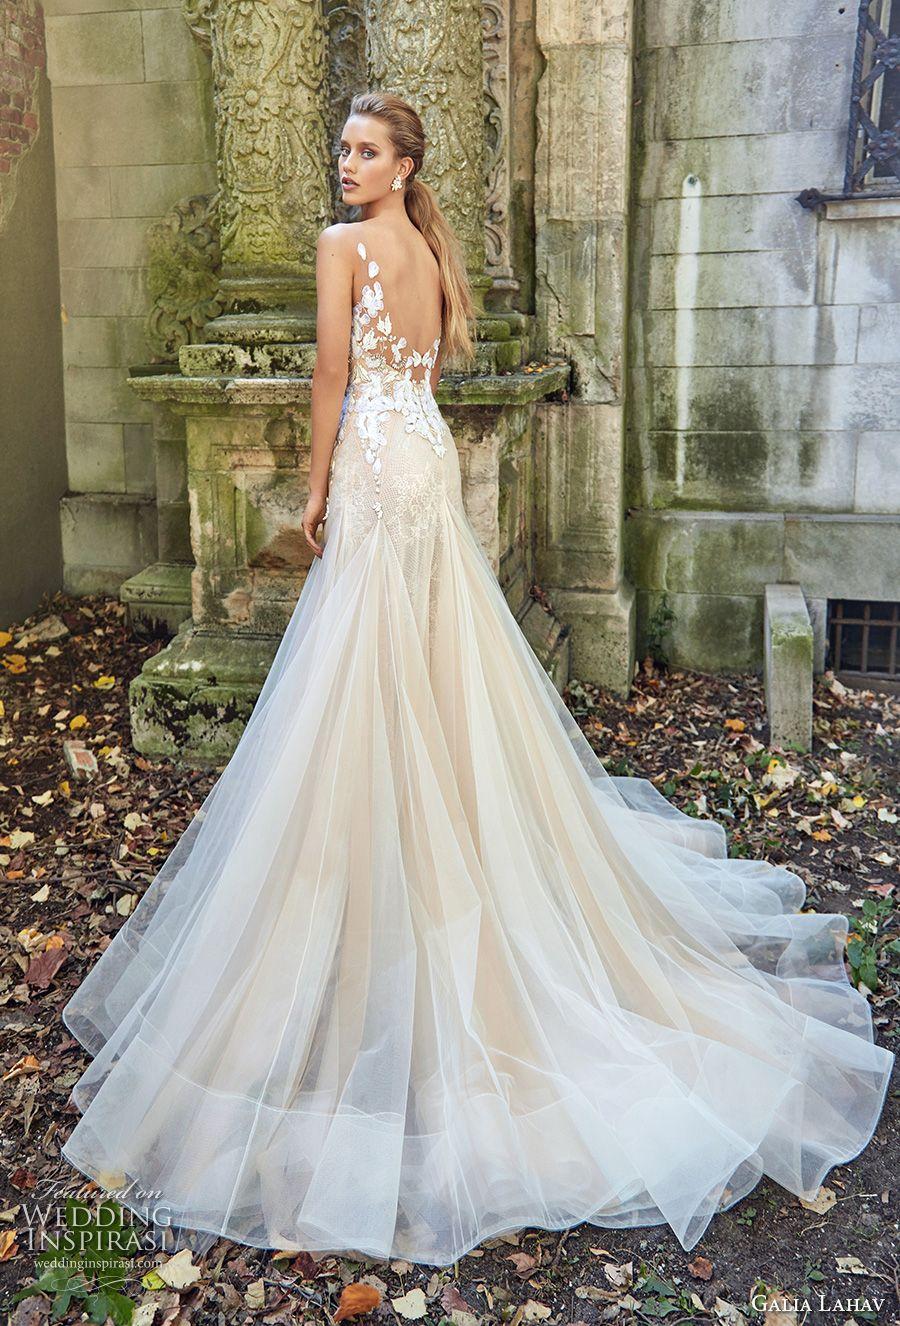 Beautiful Bridal Dreams Are Made Of These Galia Lahav Fall 2017 Wedding Dresses Wedding Inspirasi Ball Gowns Wedding Fairy Tale Wedding Dress Sheer Wedding Dress [ 1326 x 900 Pixel ]